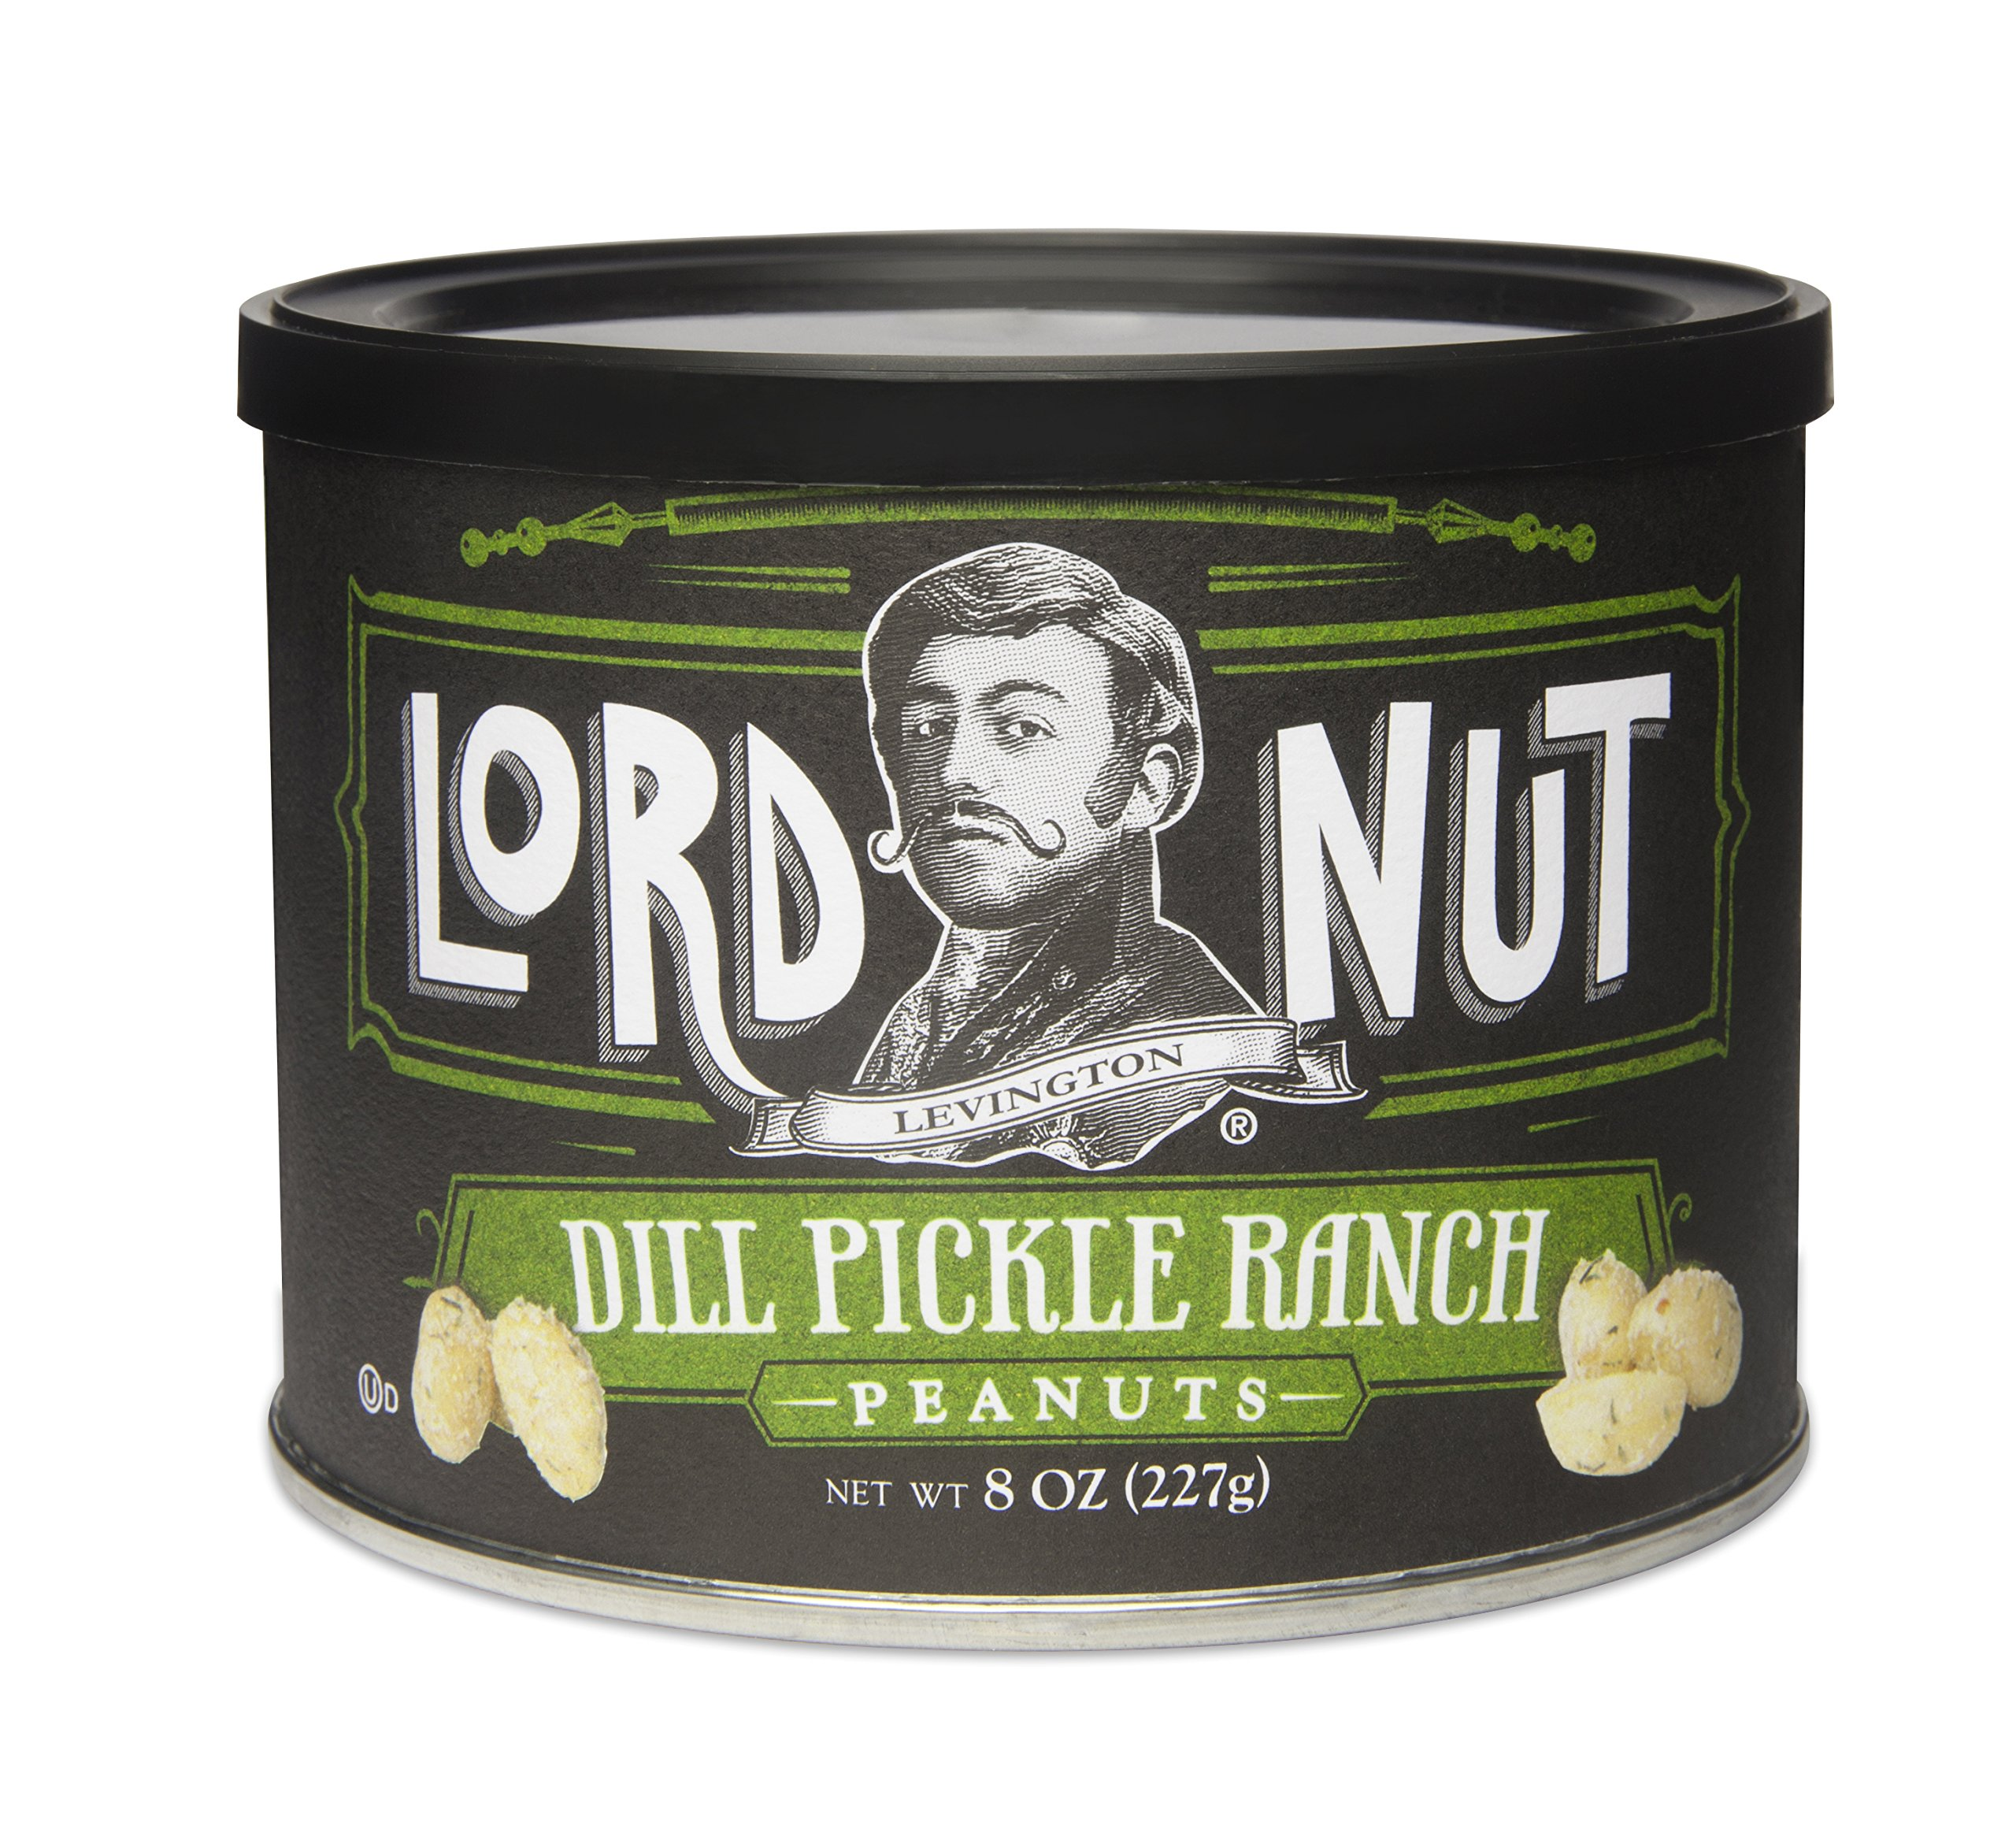 Lord Nut Levington Peanut Dill Pickle Ranch, 8 oz